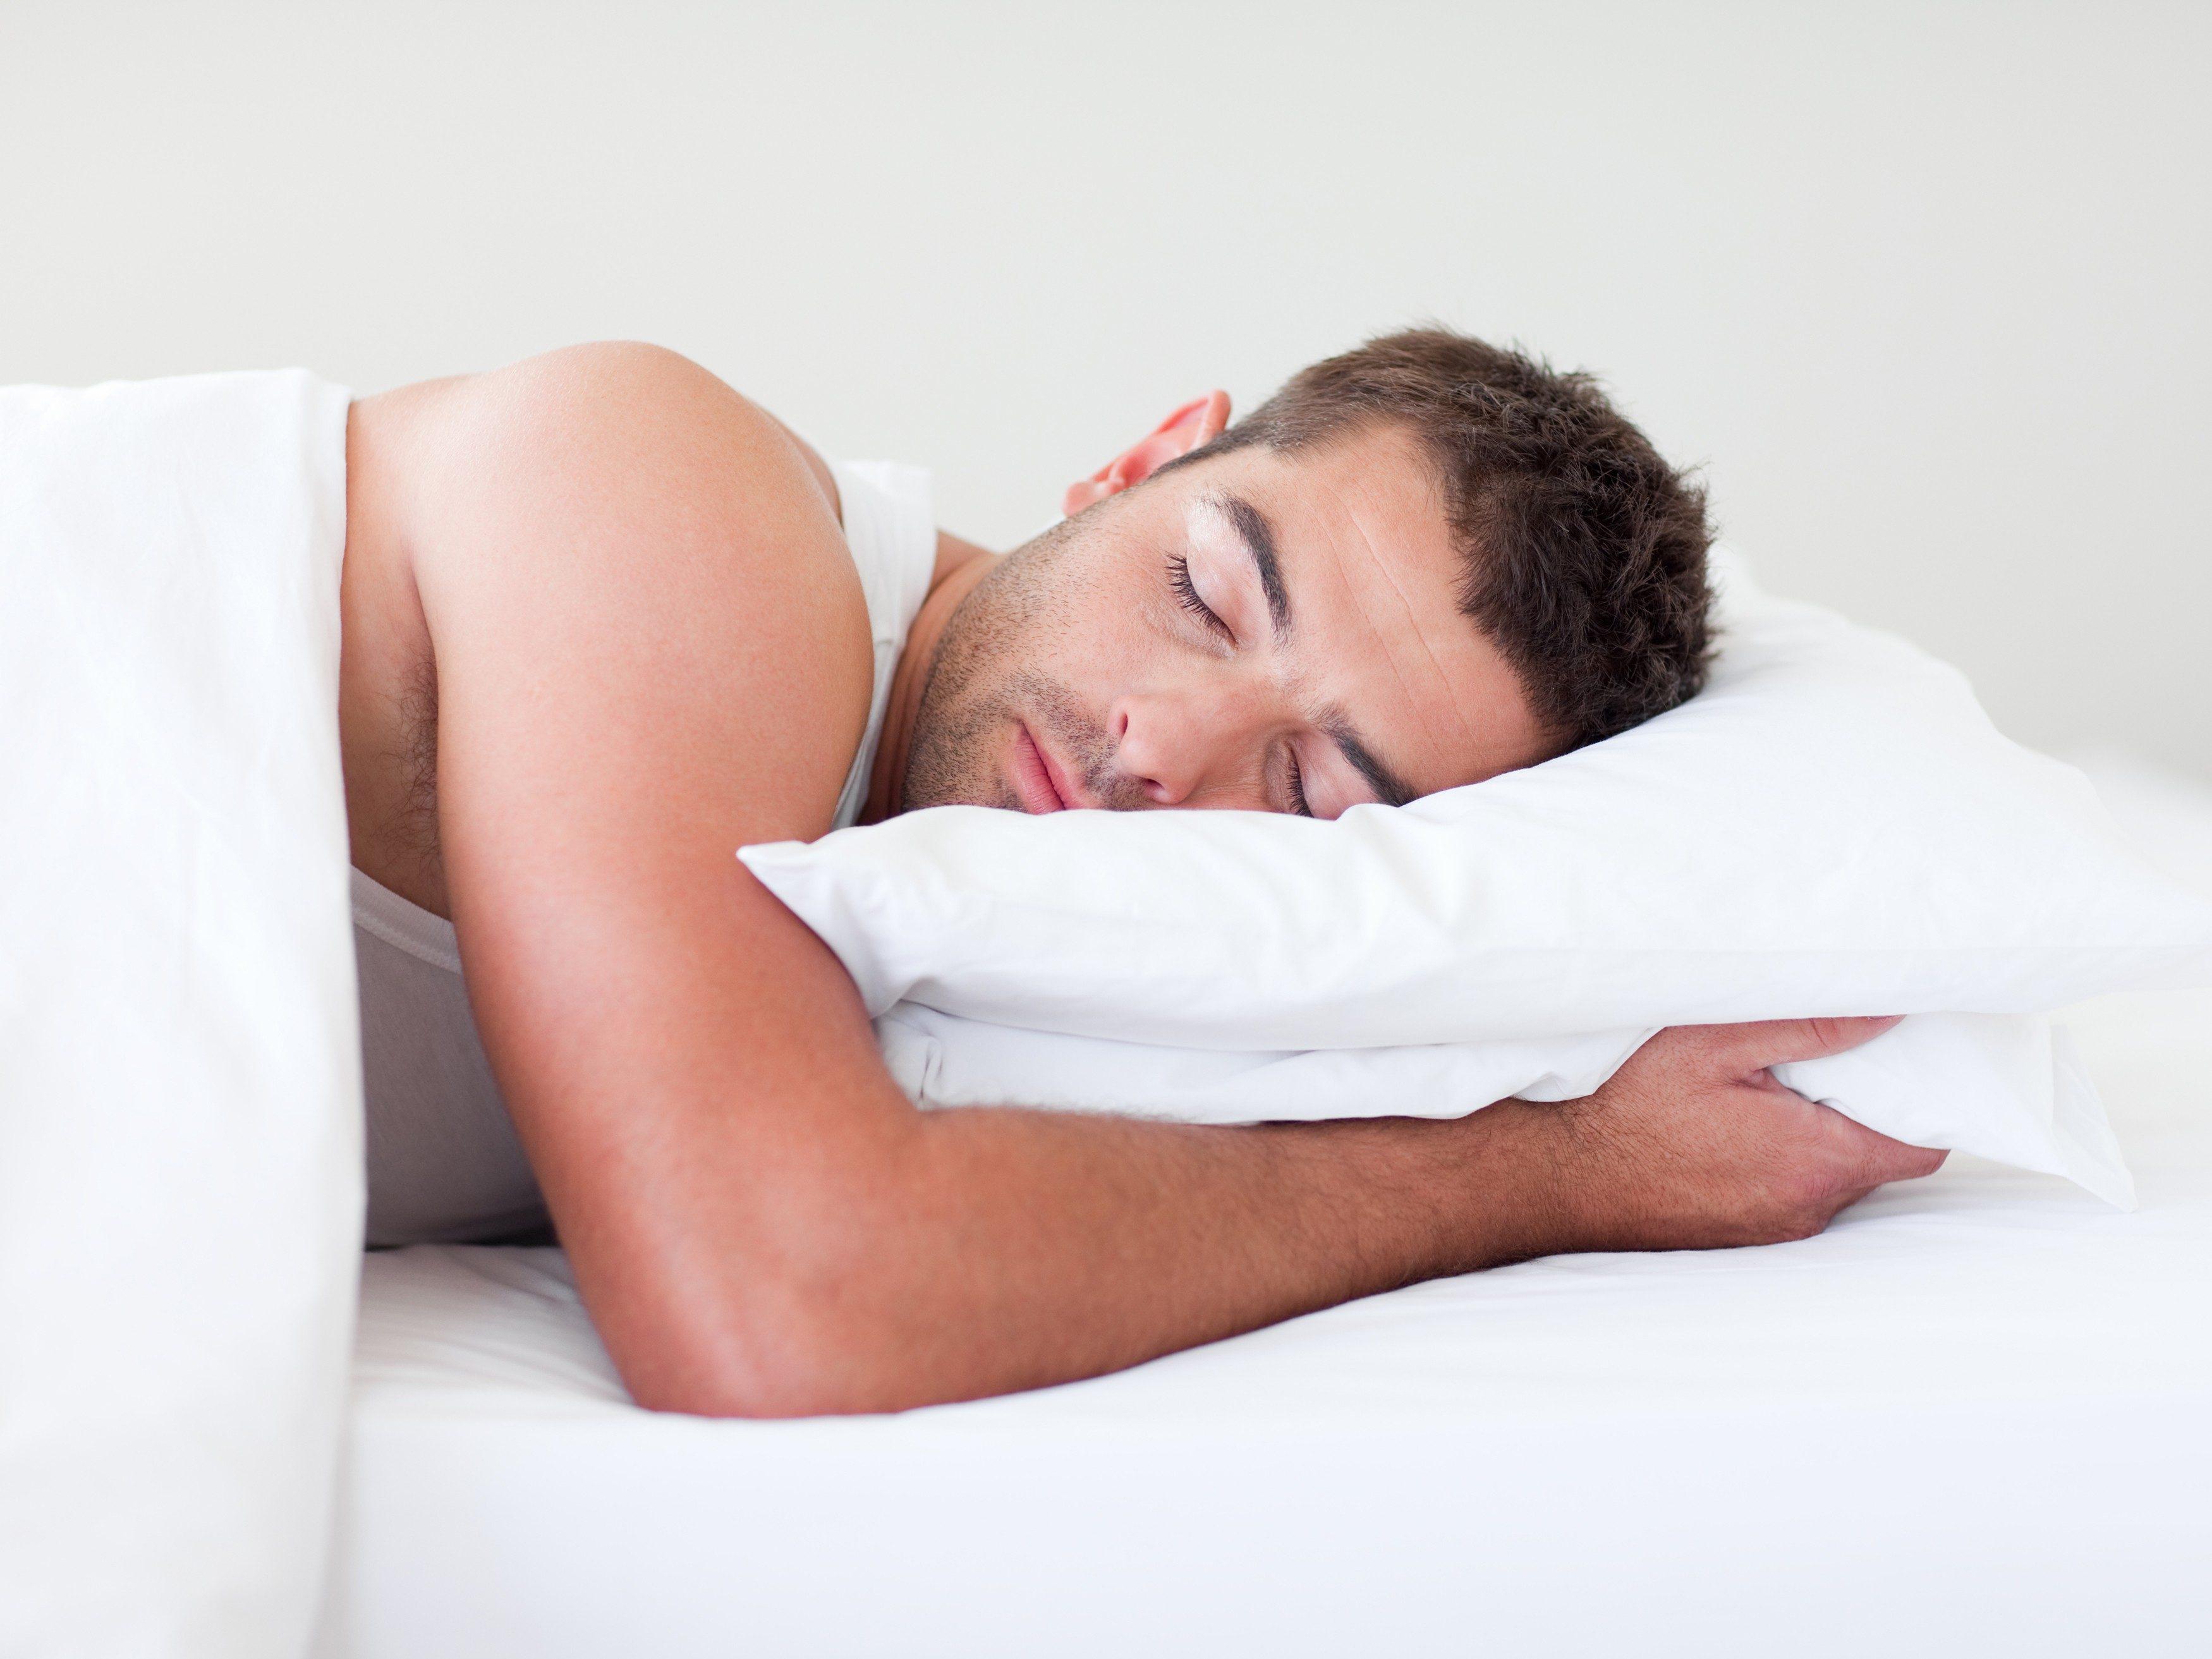 6. Get a good night's sleep